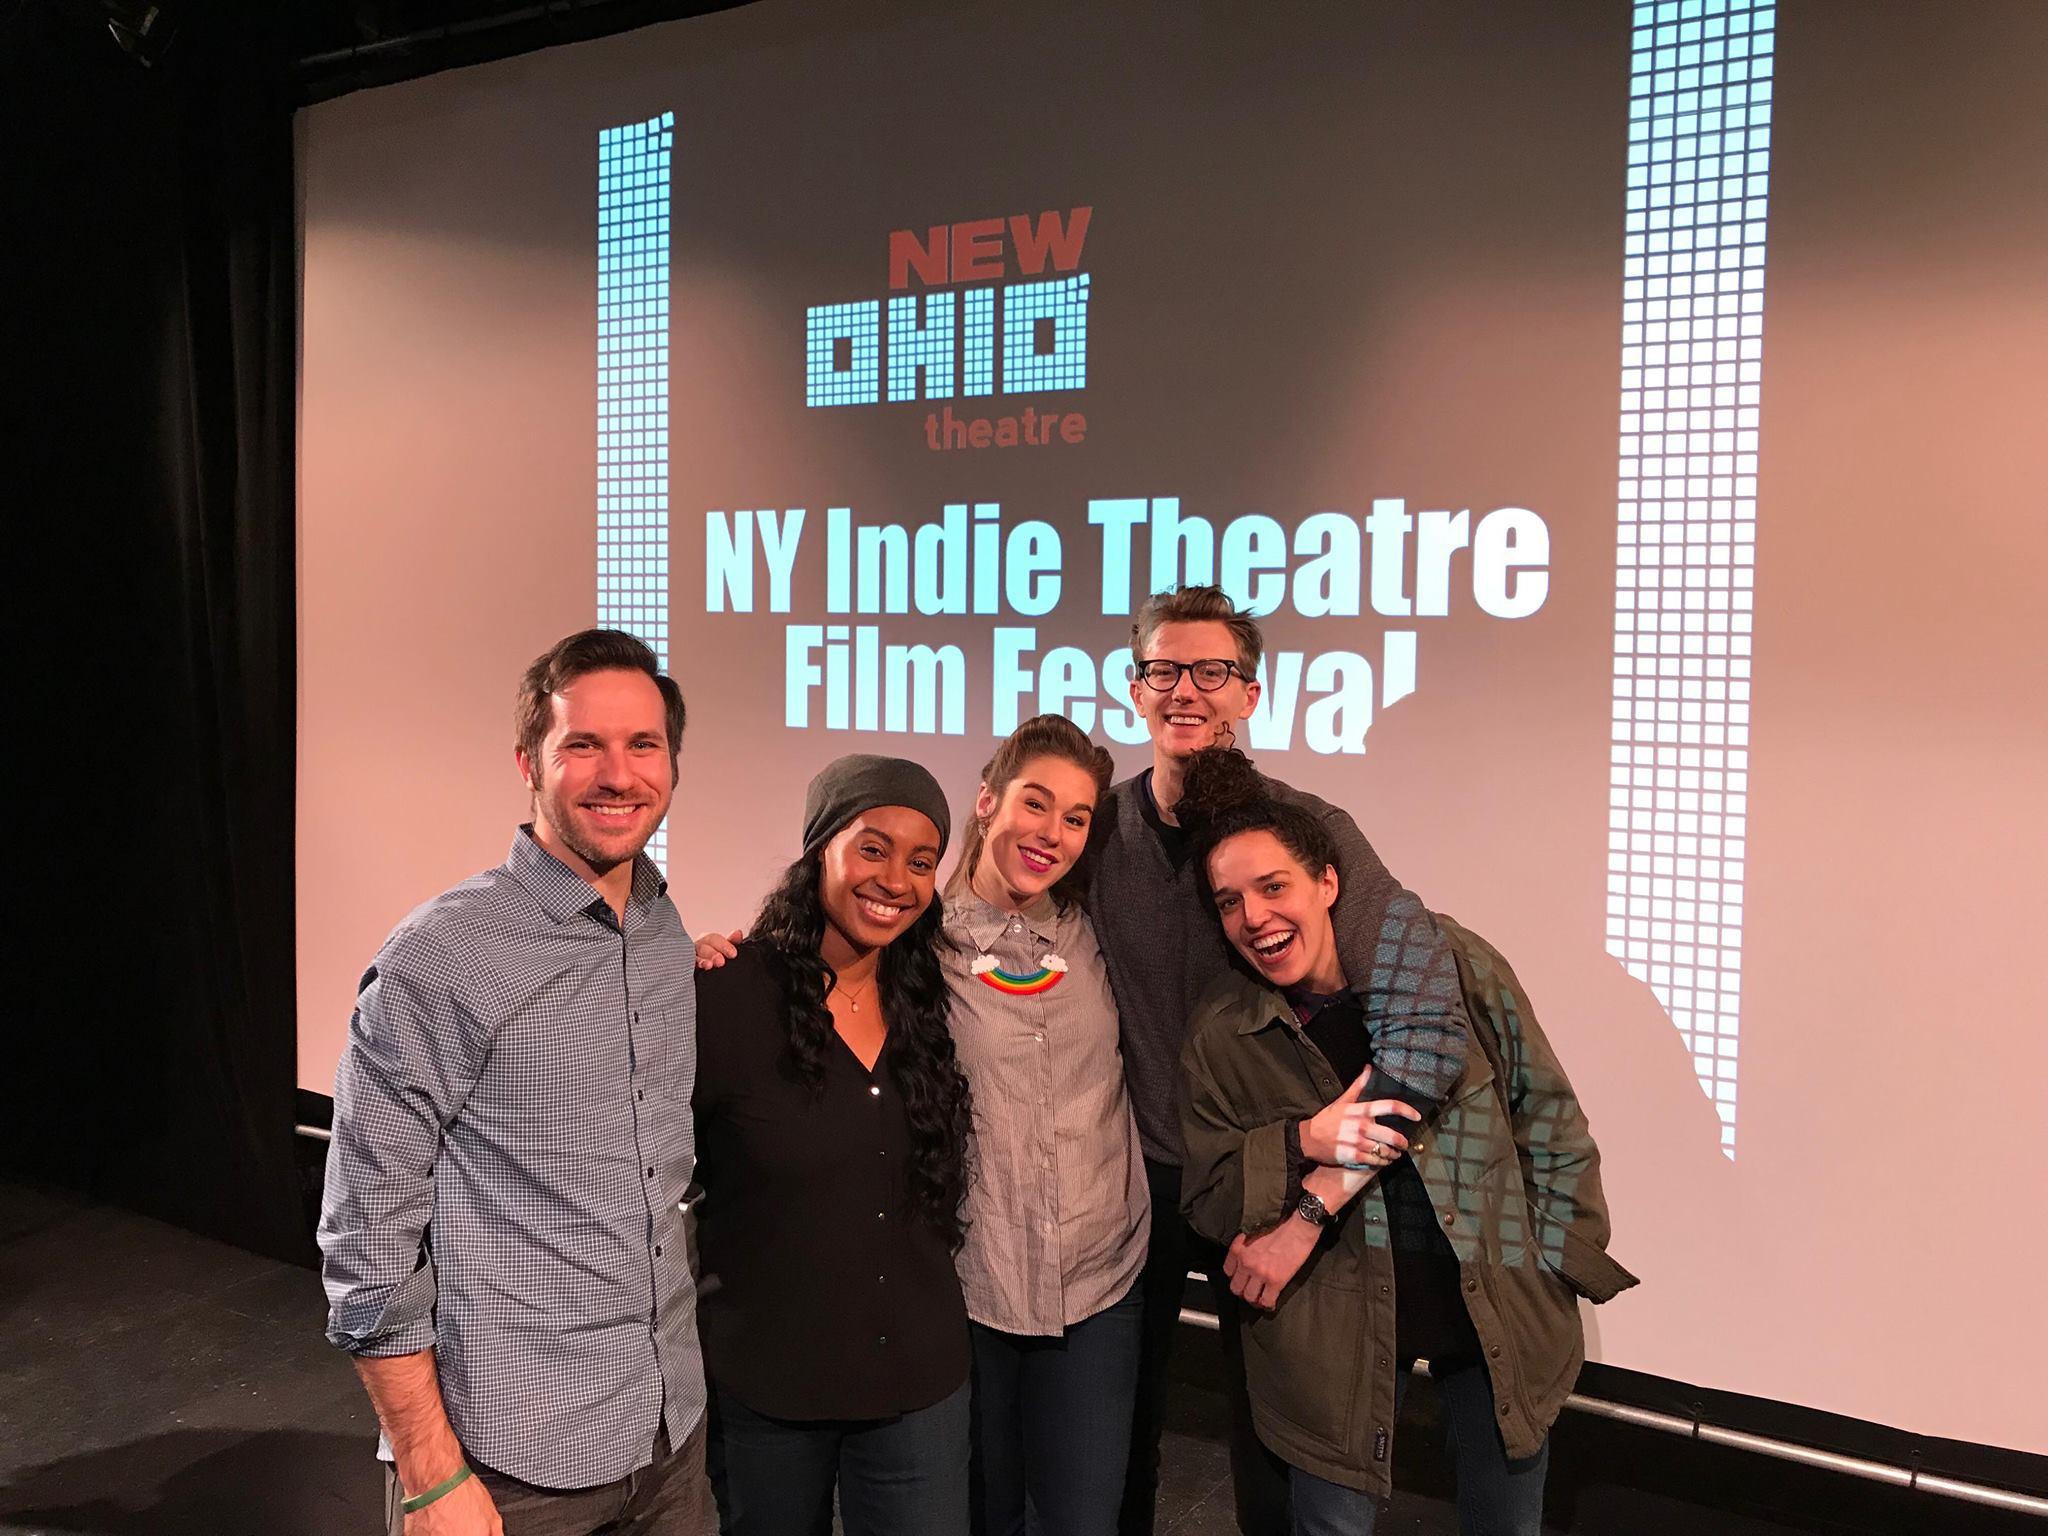 NY India Film Fest finalists Ryan Belock, Brittane Rowe, Lucy Lavely, Josh Jeffers, Meriette Strauss